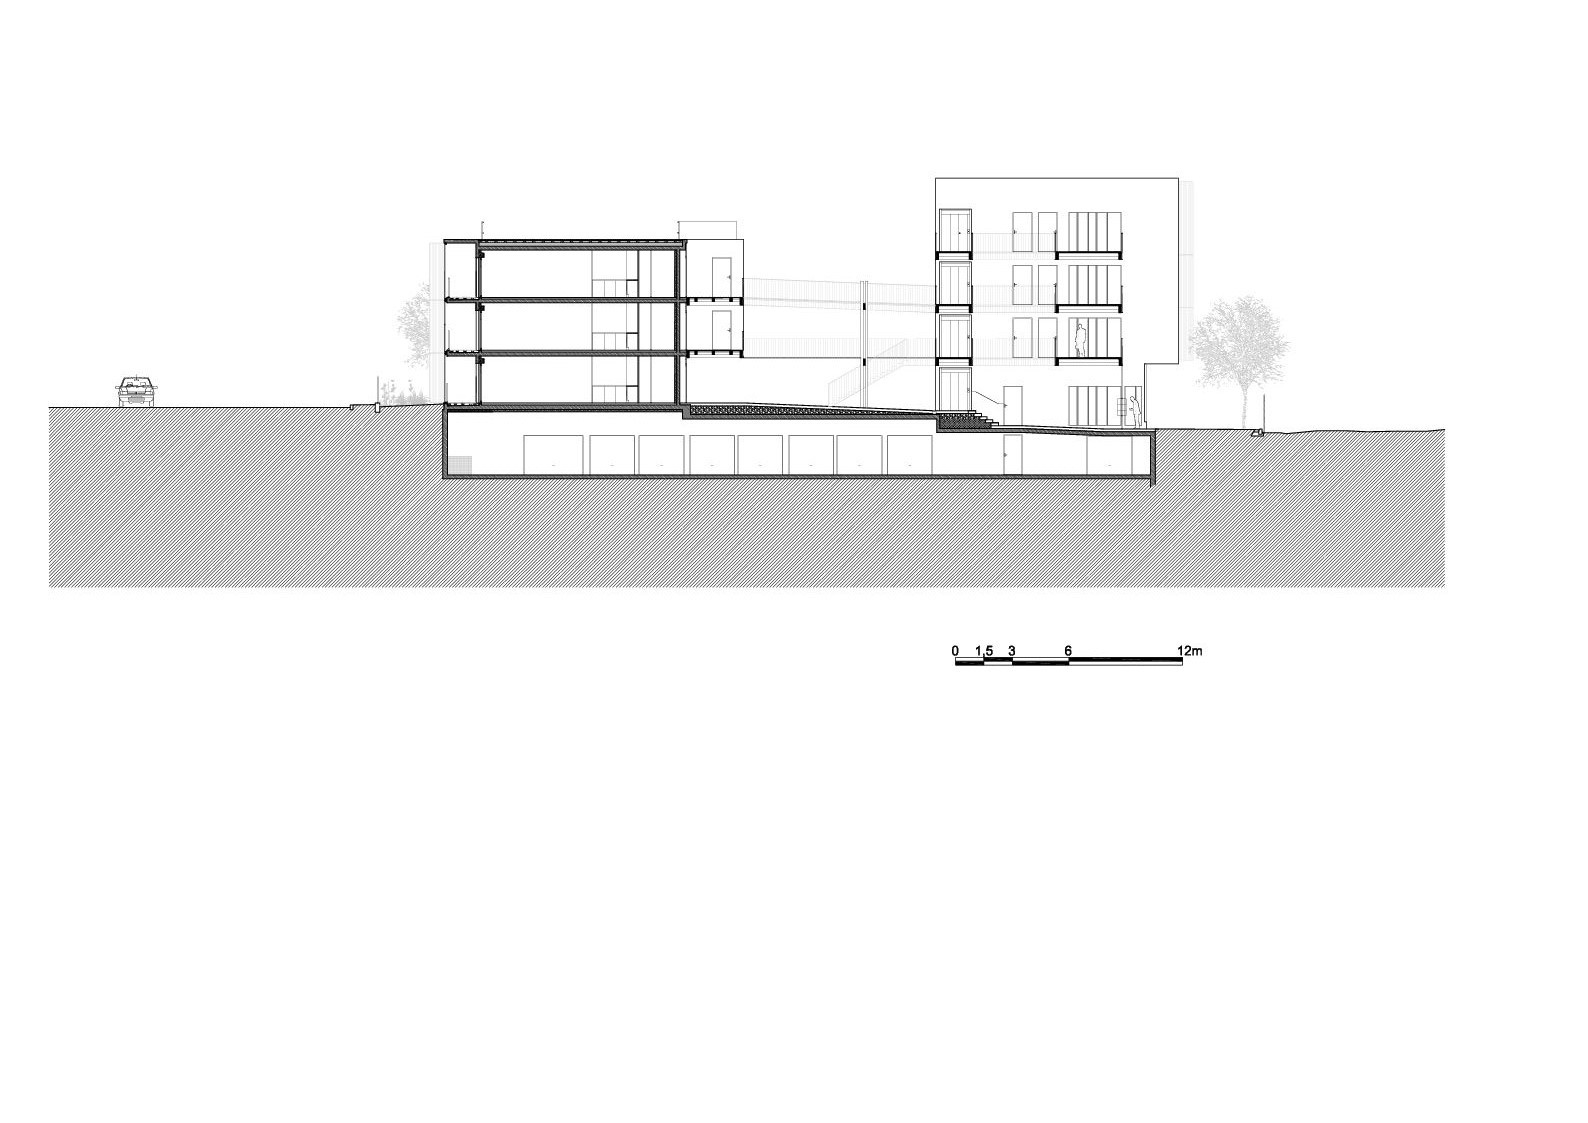 galer a de vivienda social tiendas en mouans sartoux comte et vollenweider architectes 45. Black Bedroom Furniture Sets. Home Design Ideas